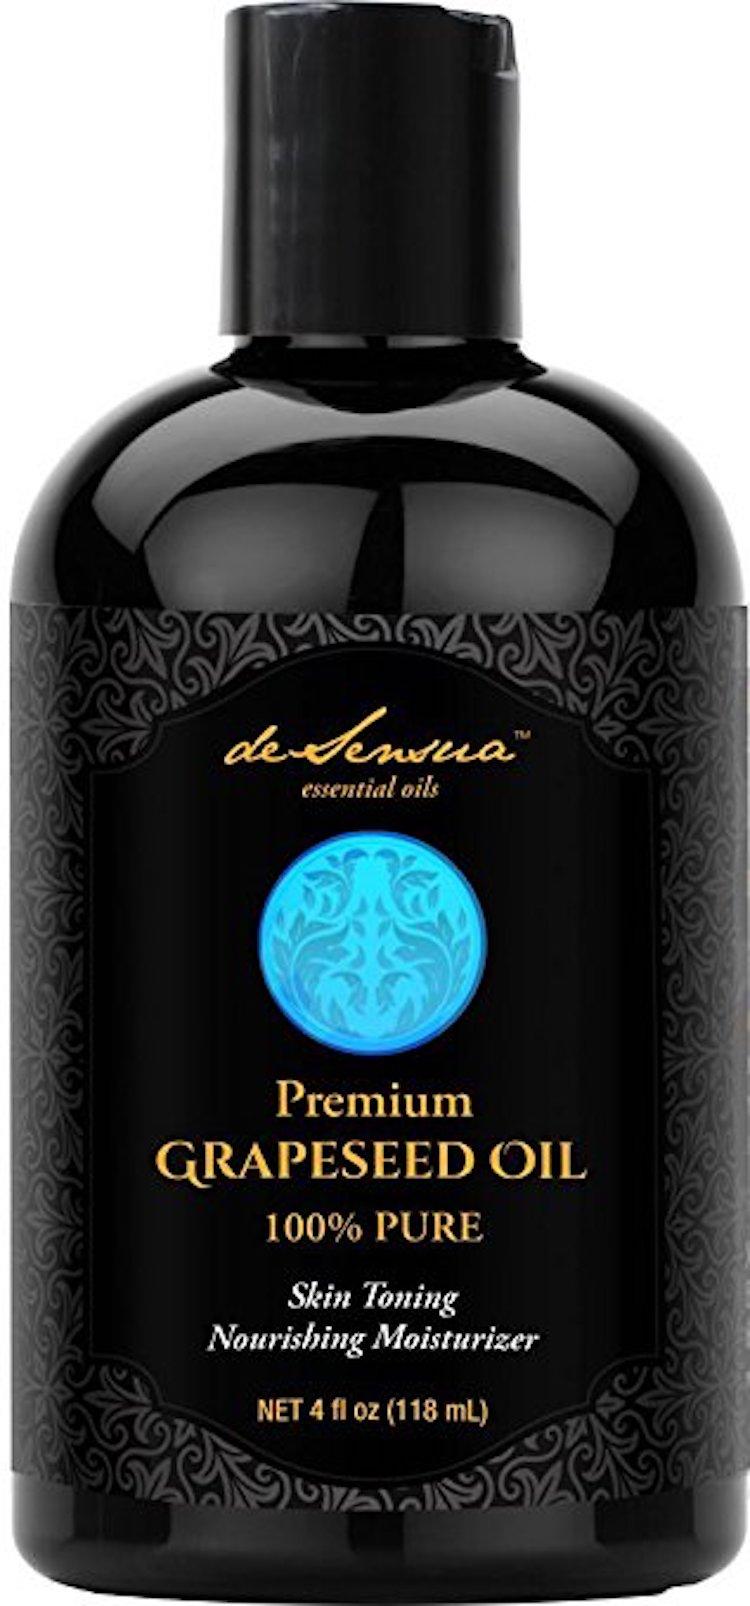 DeSensua Grapeseed Massage Oil